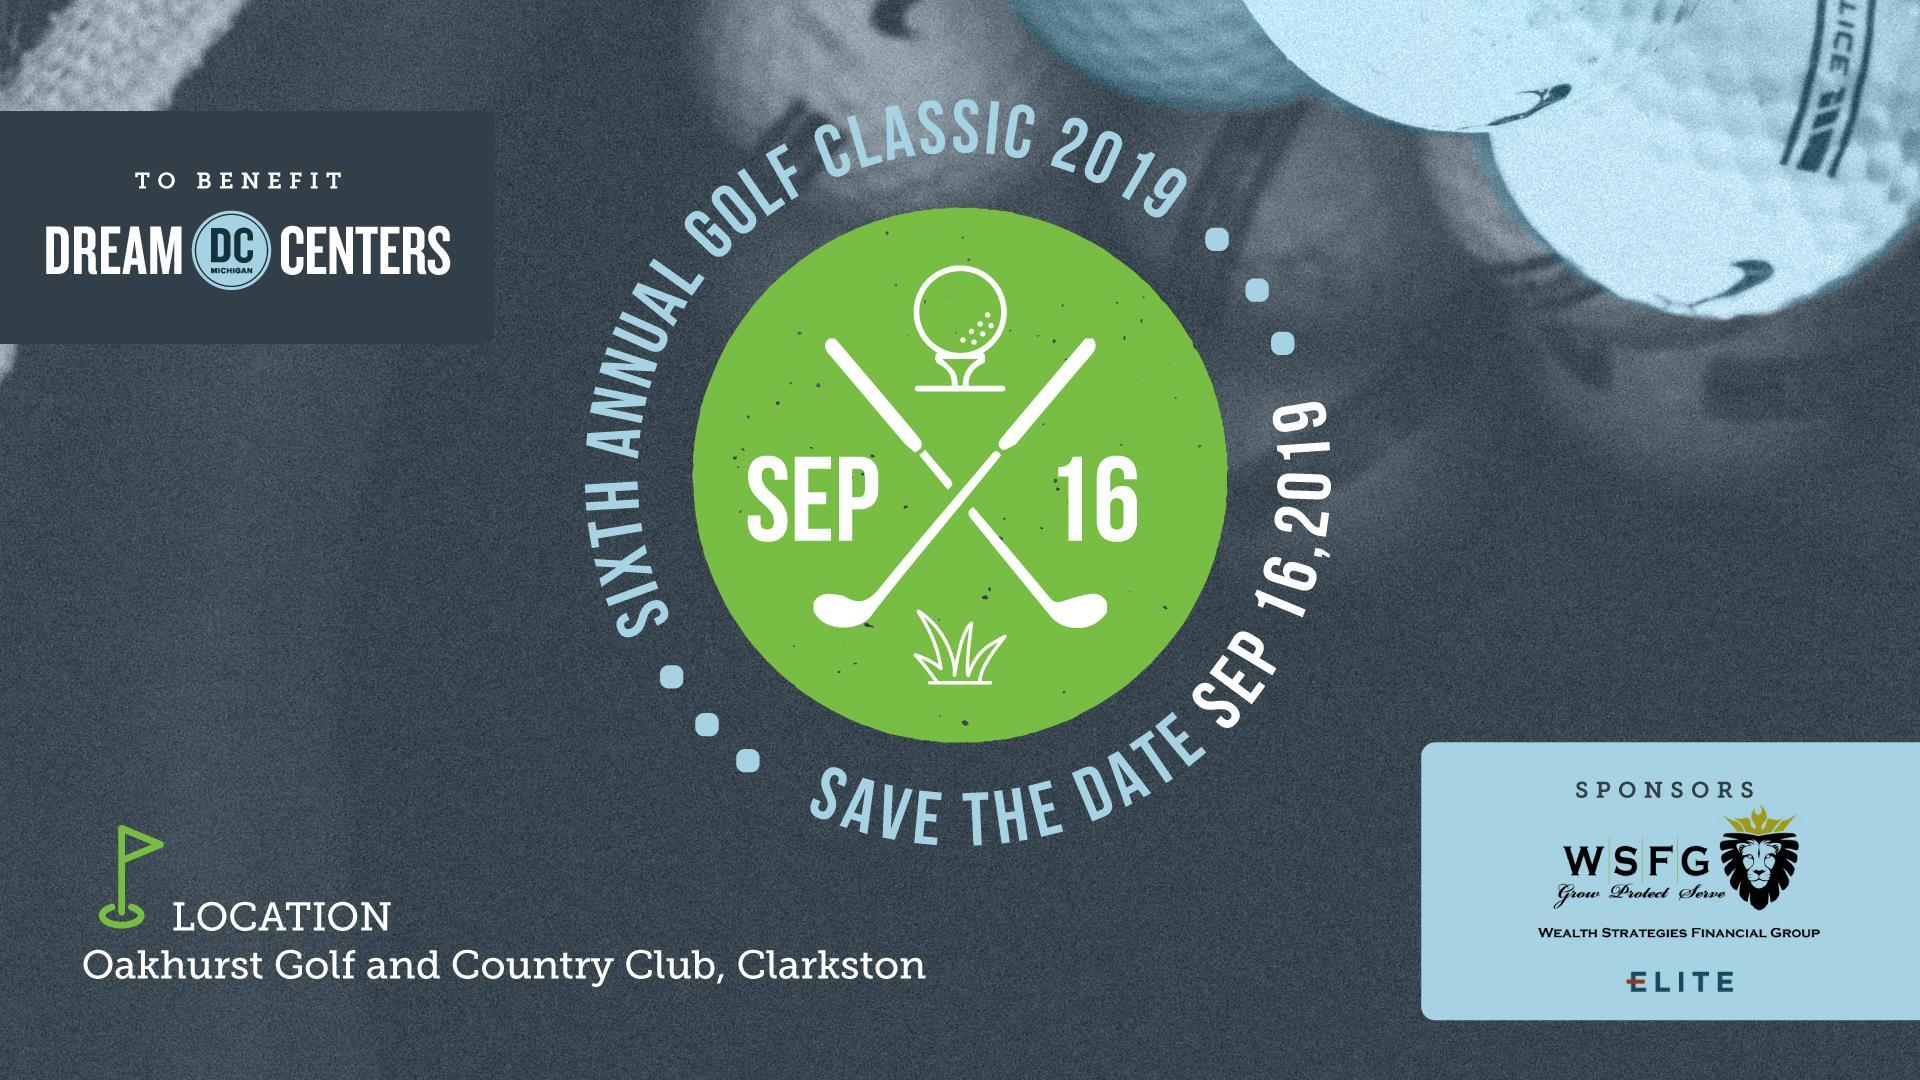 Sixth Annual Golf Classic